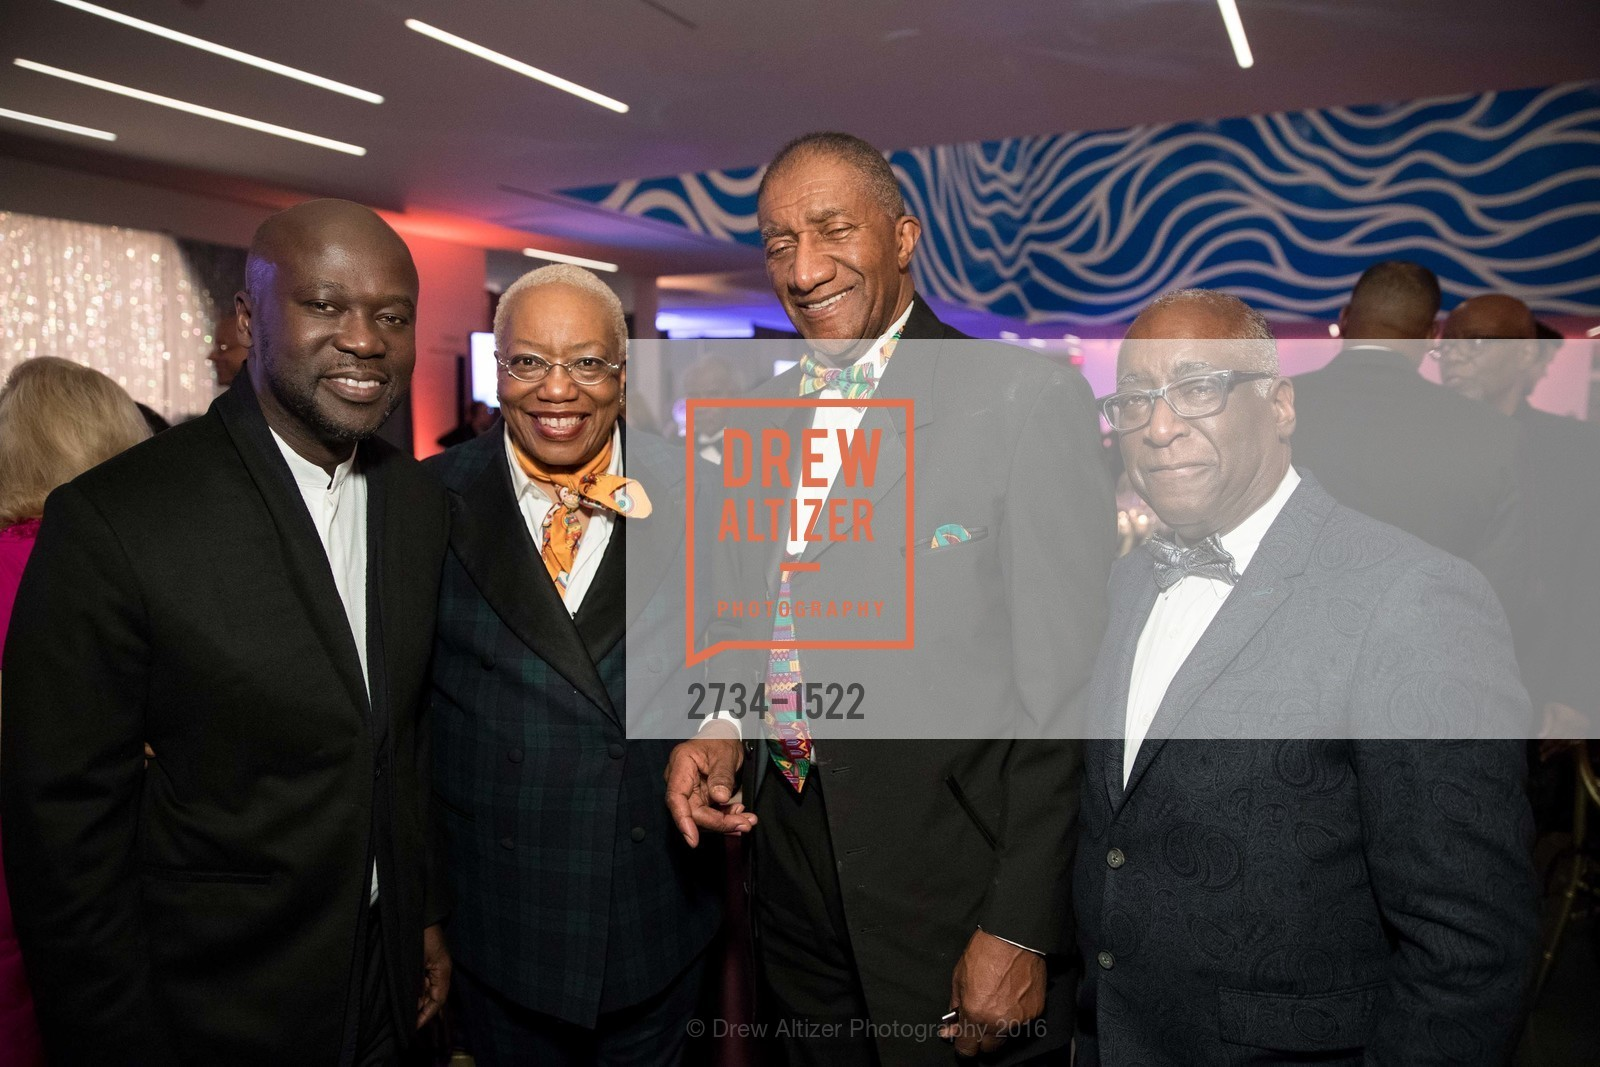 David Adjaye, Linda Harrison, Michael Warr, Photo #2734-1522